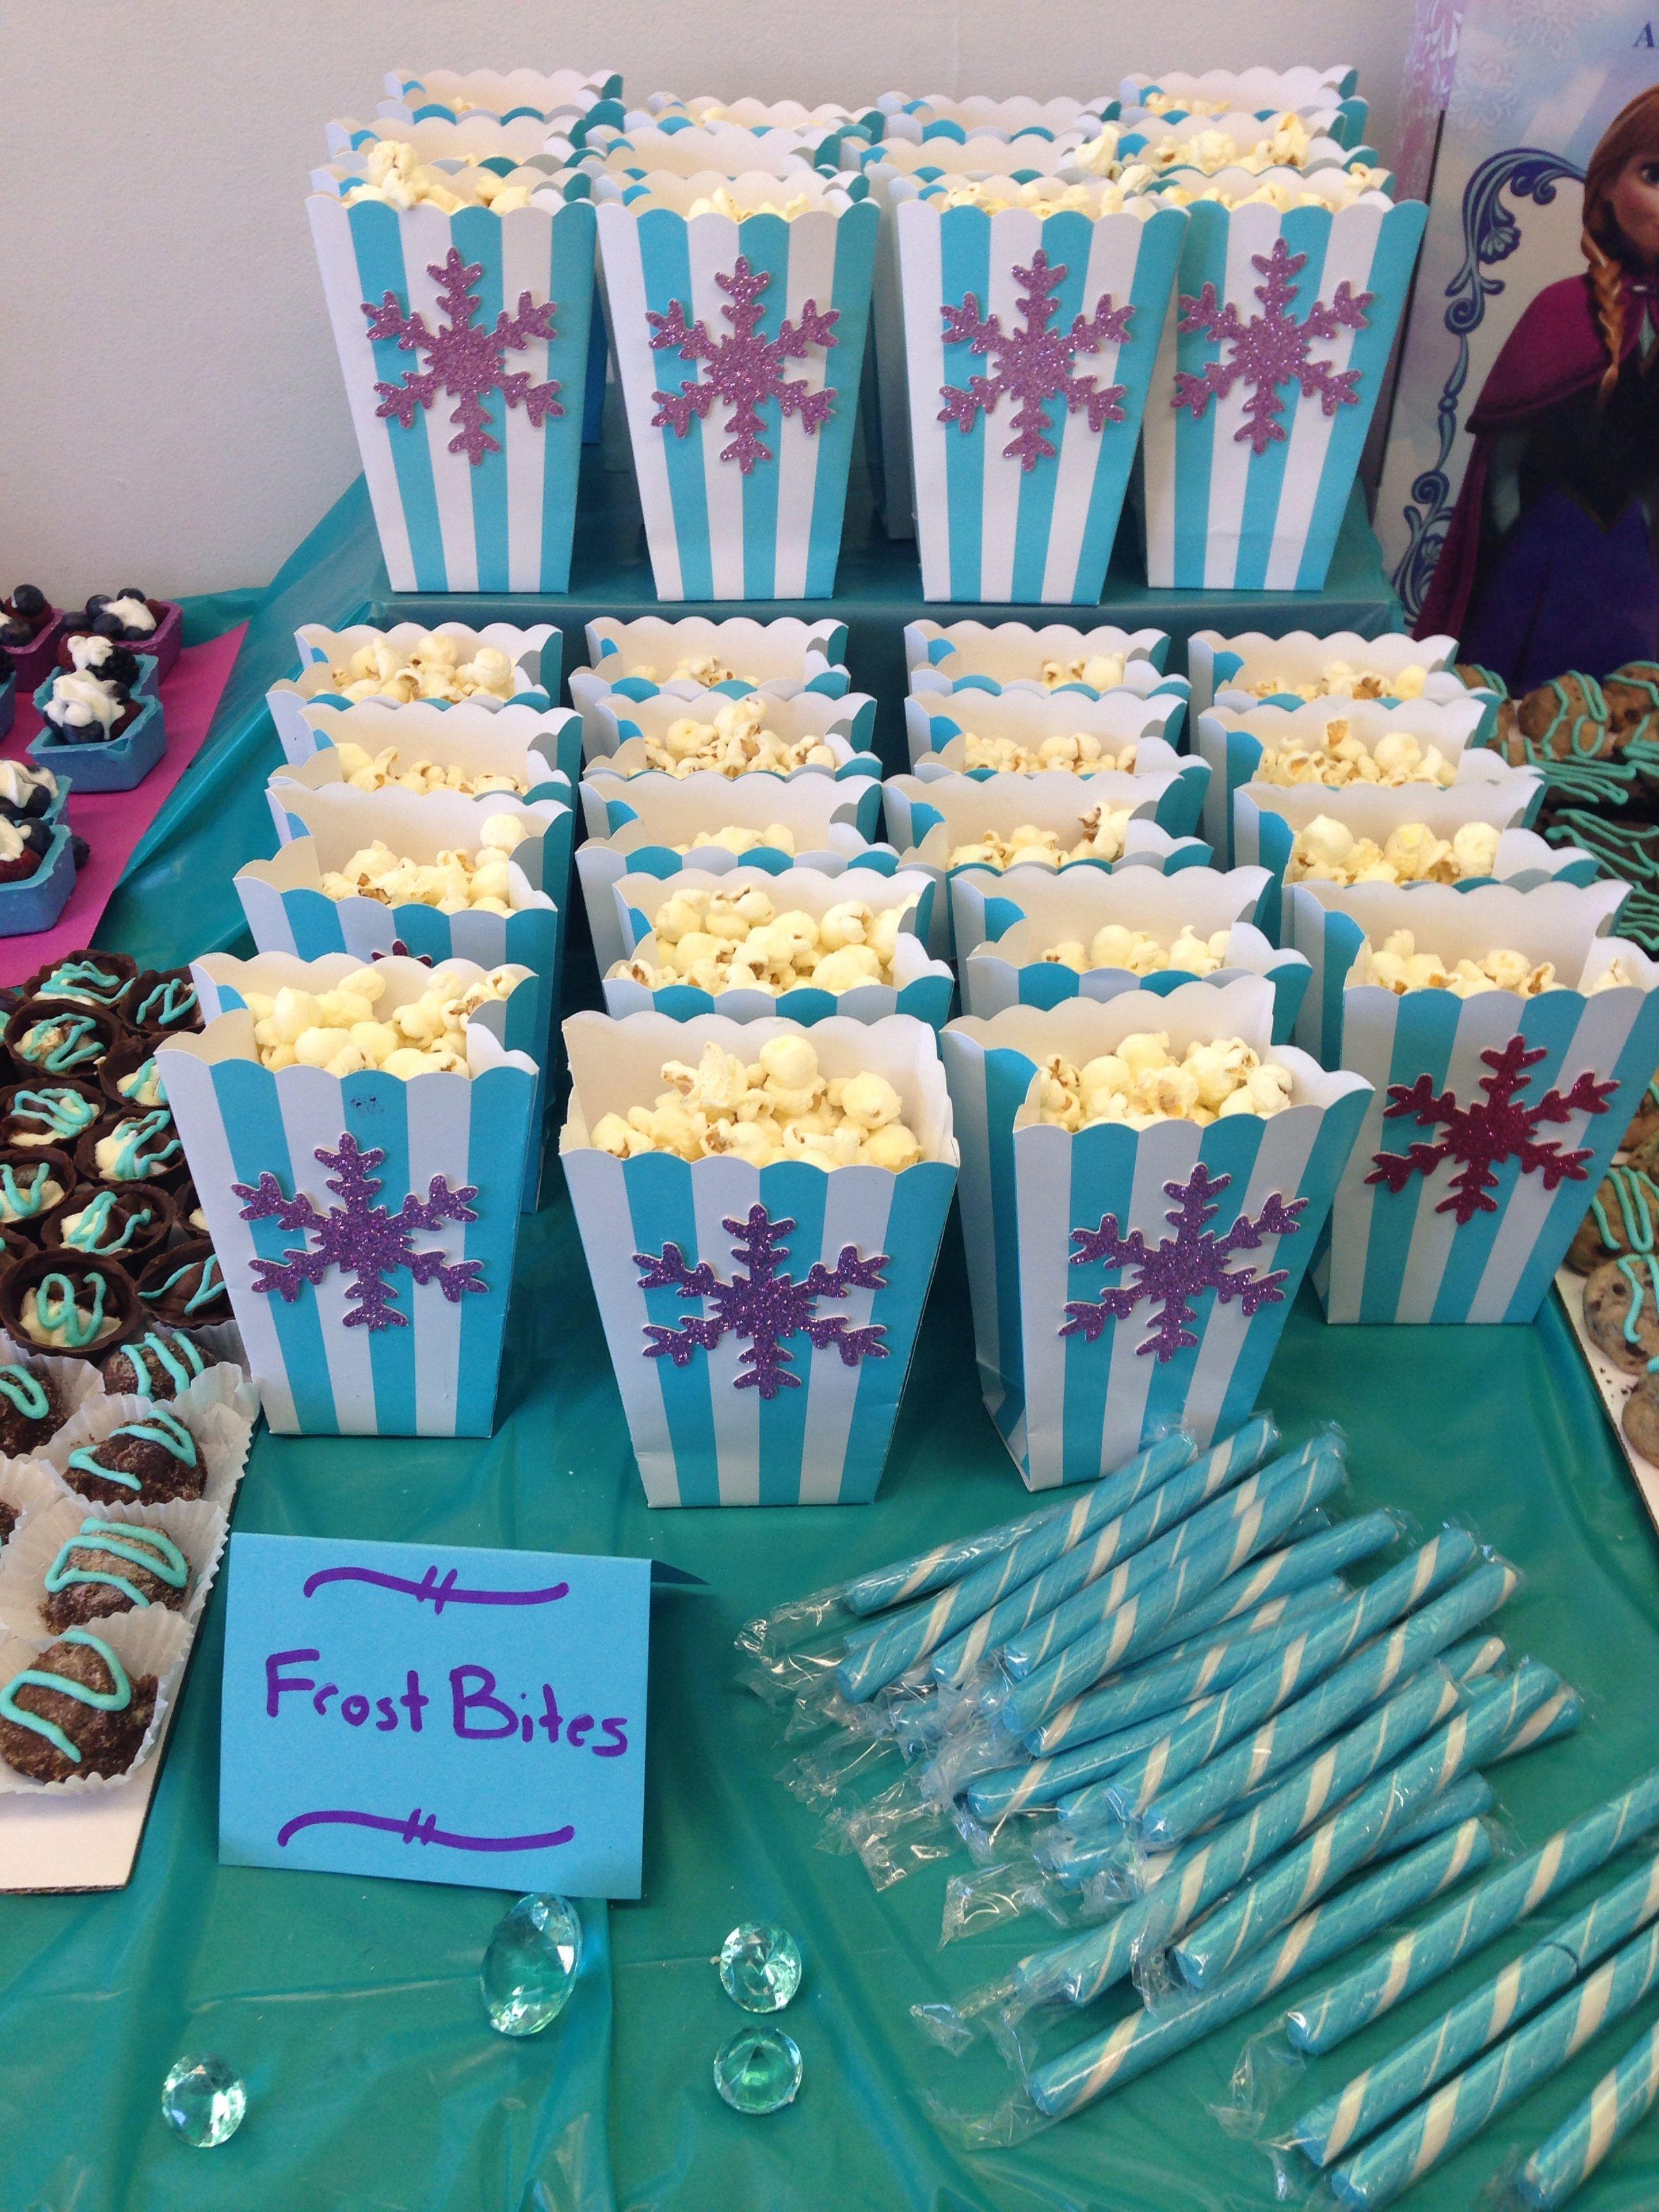 Fiesta De Cumpleanos Frozen 101 Ideas Originales Fiesta - Cumpleaos-ideas-originales